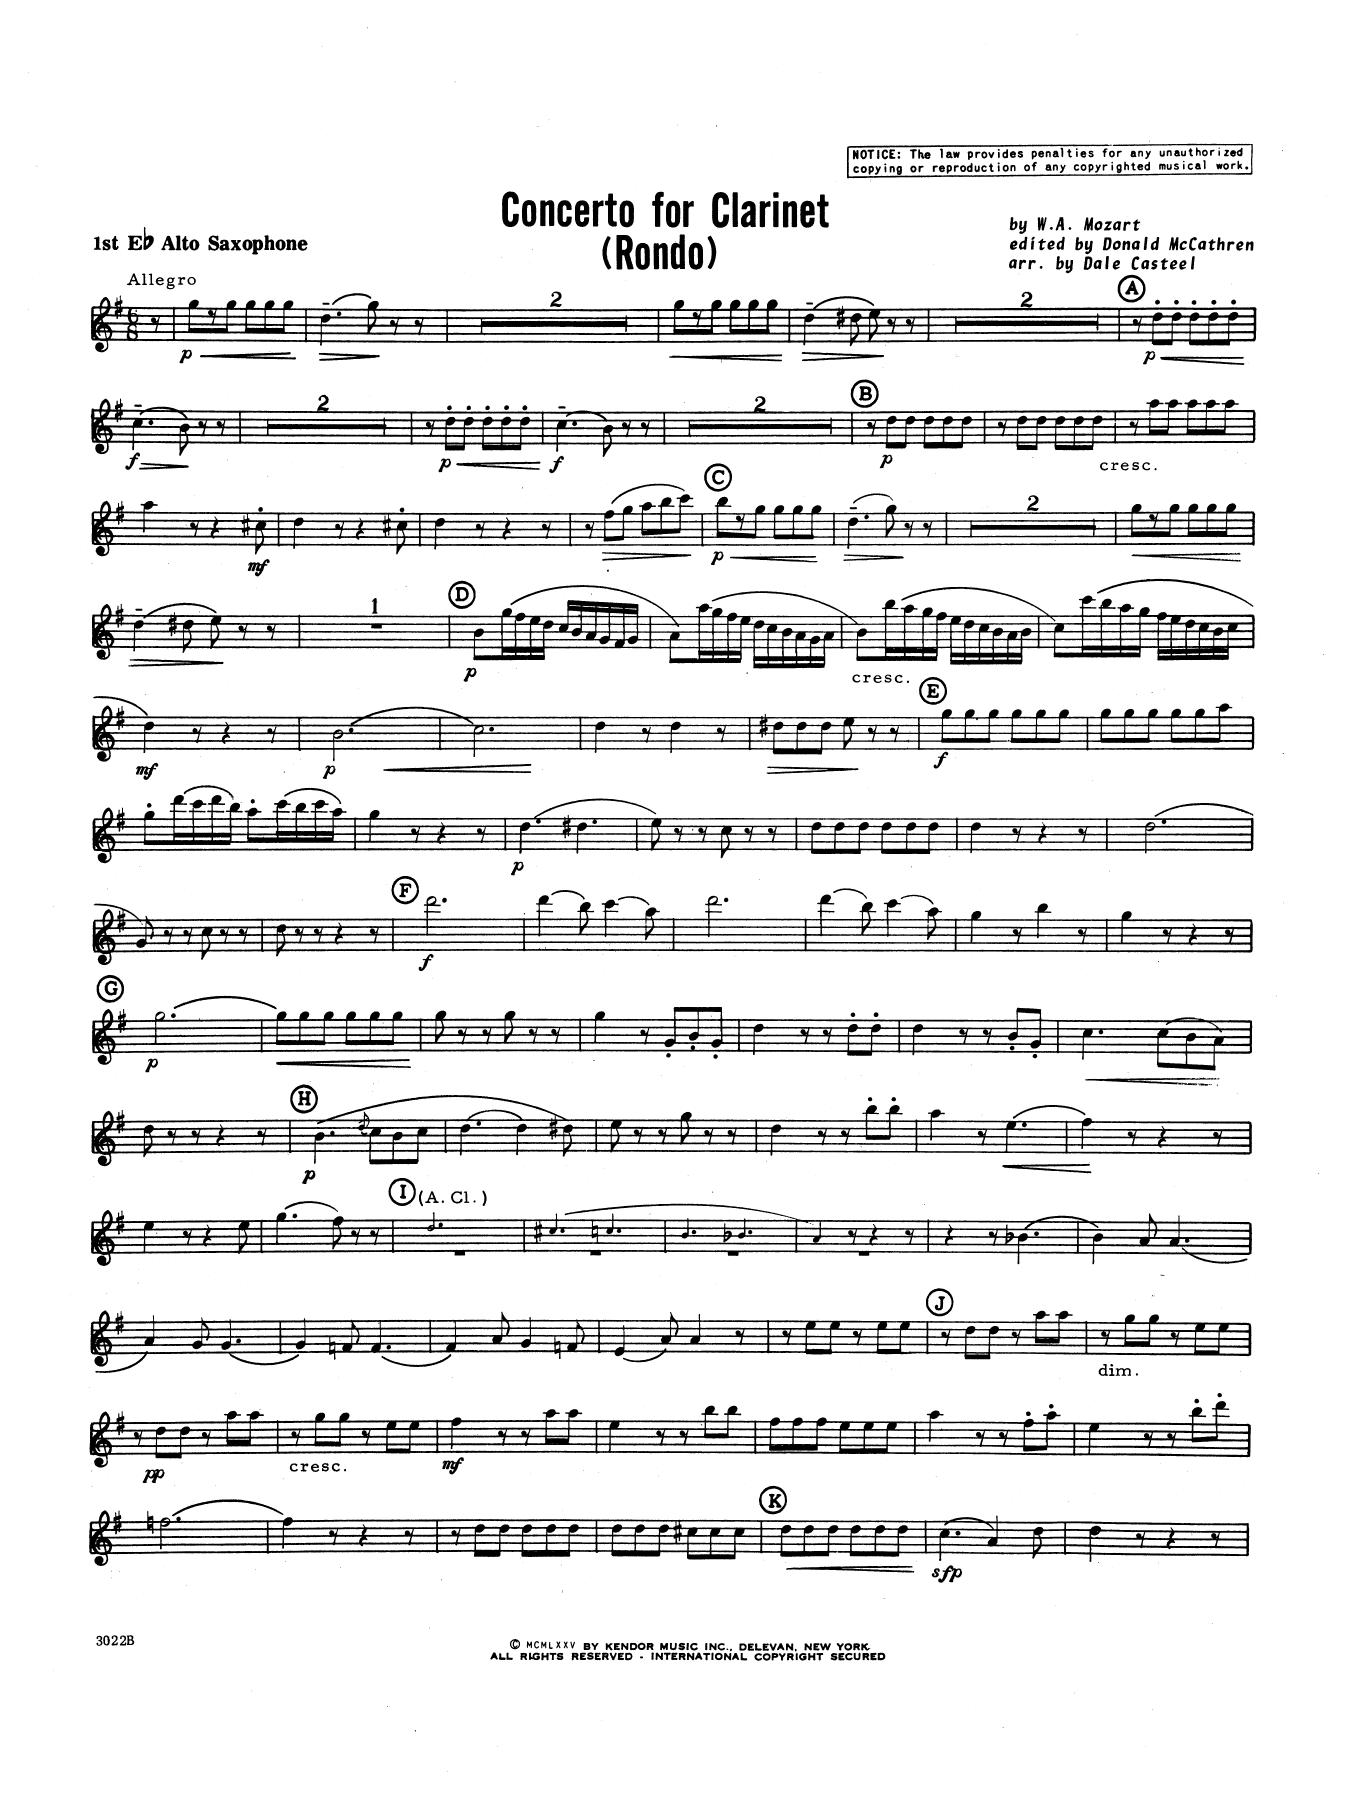 Donald McCathren and Dale Casteel Concerto For Clarinet - Rondo (3rd Movement) - K.622 - 1st Eb Alto Saxophone sheet music notes printable PDF score